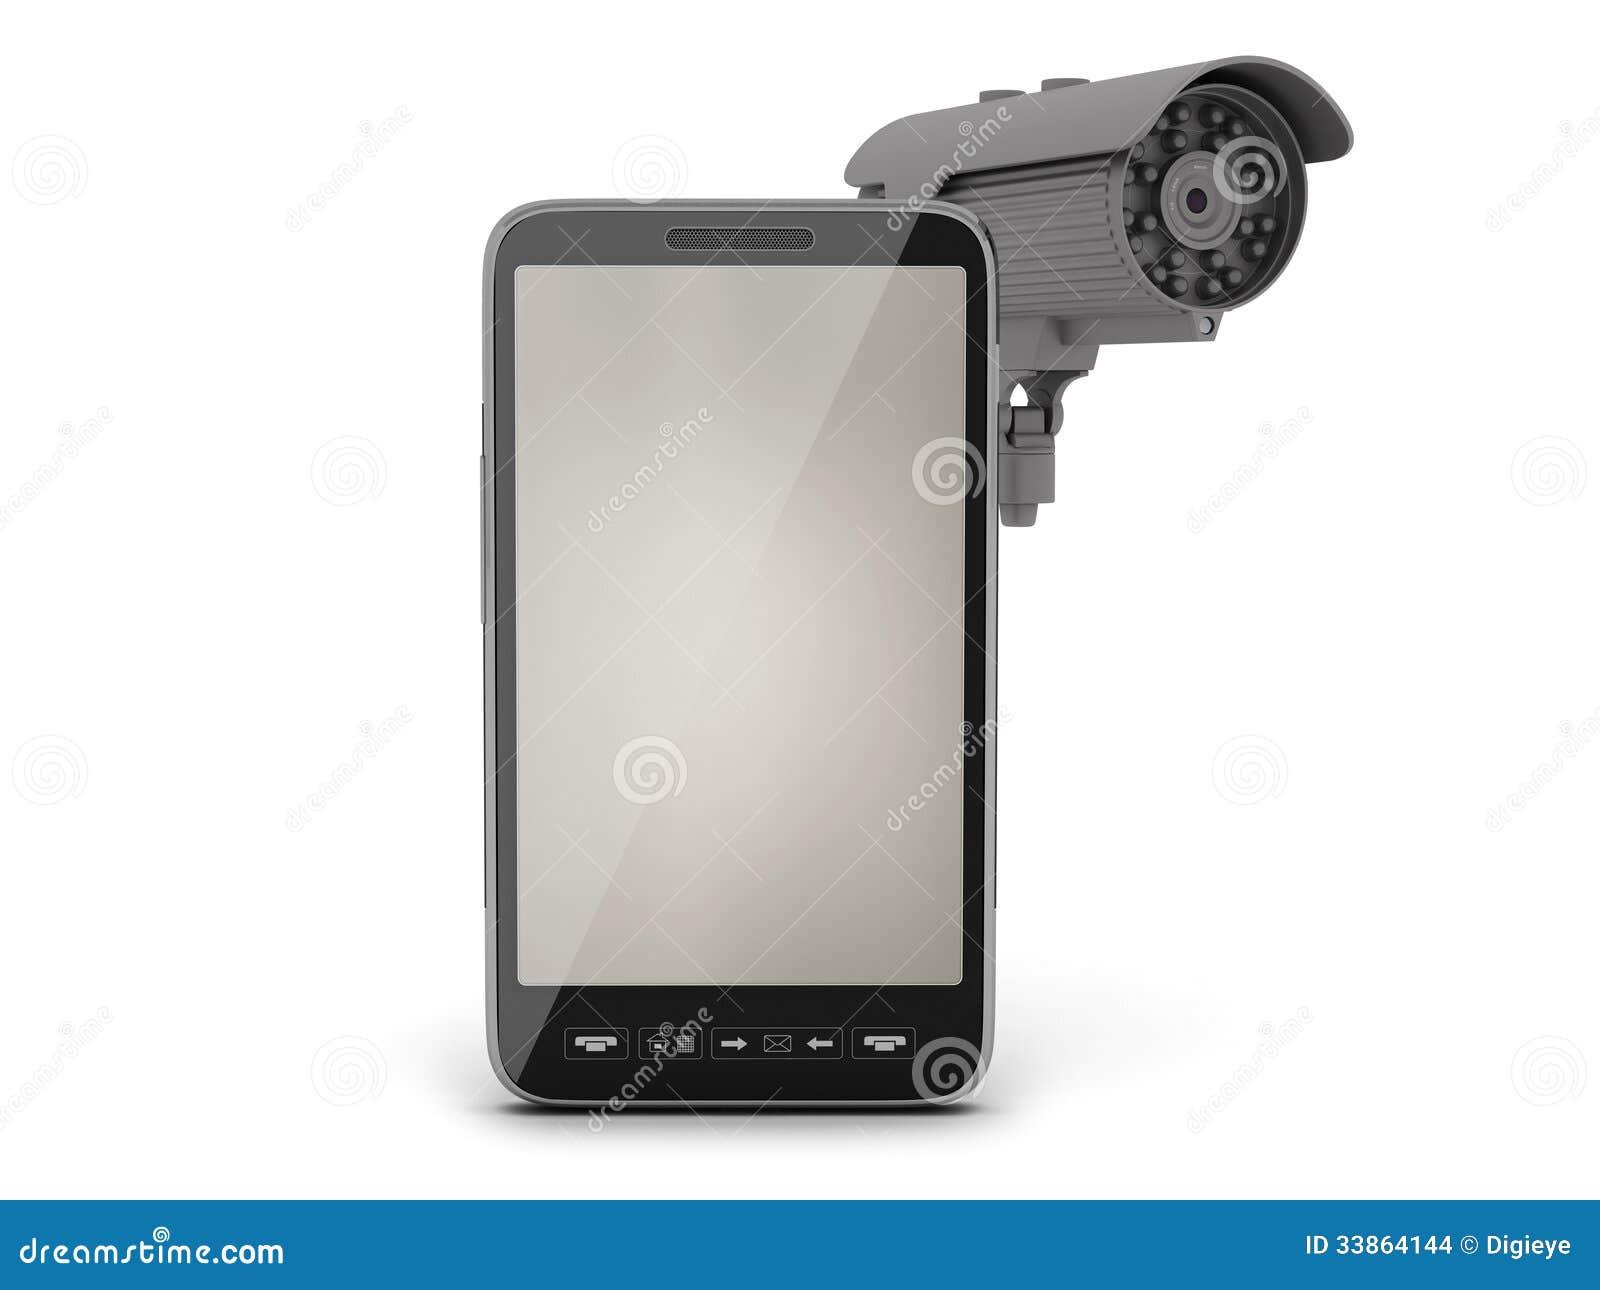 video surveillance phone